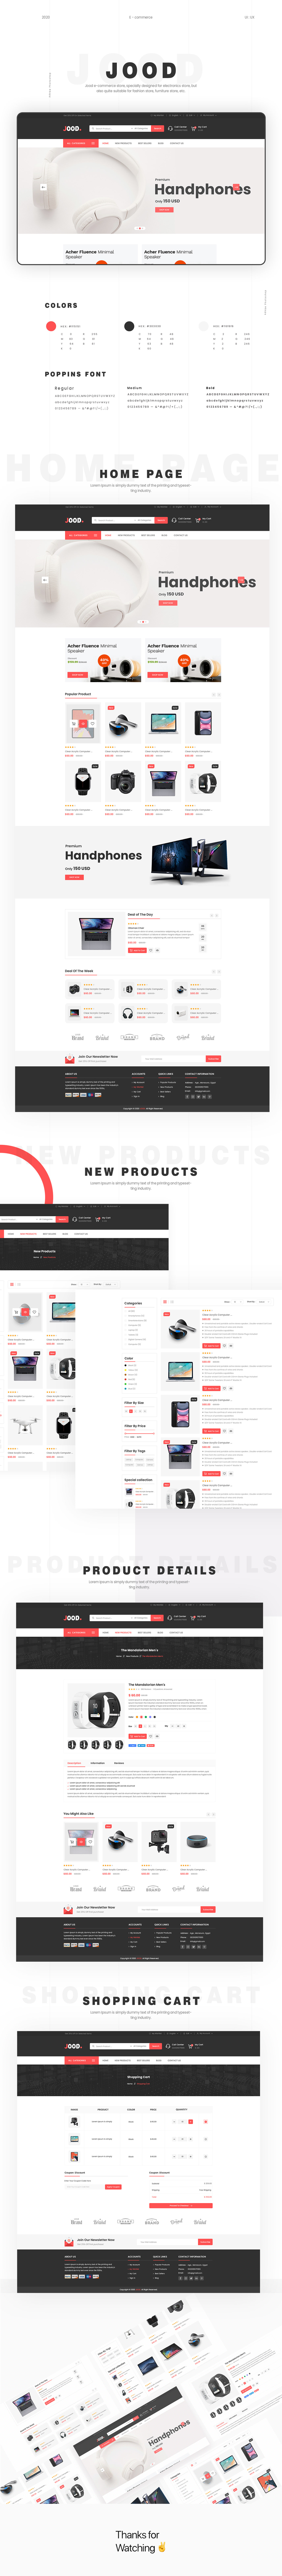 clothing store Ecommerce Electronics store jood shop Shopping Store store uiux uiuxDesigner Website